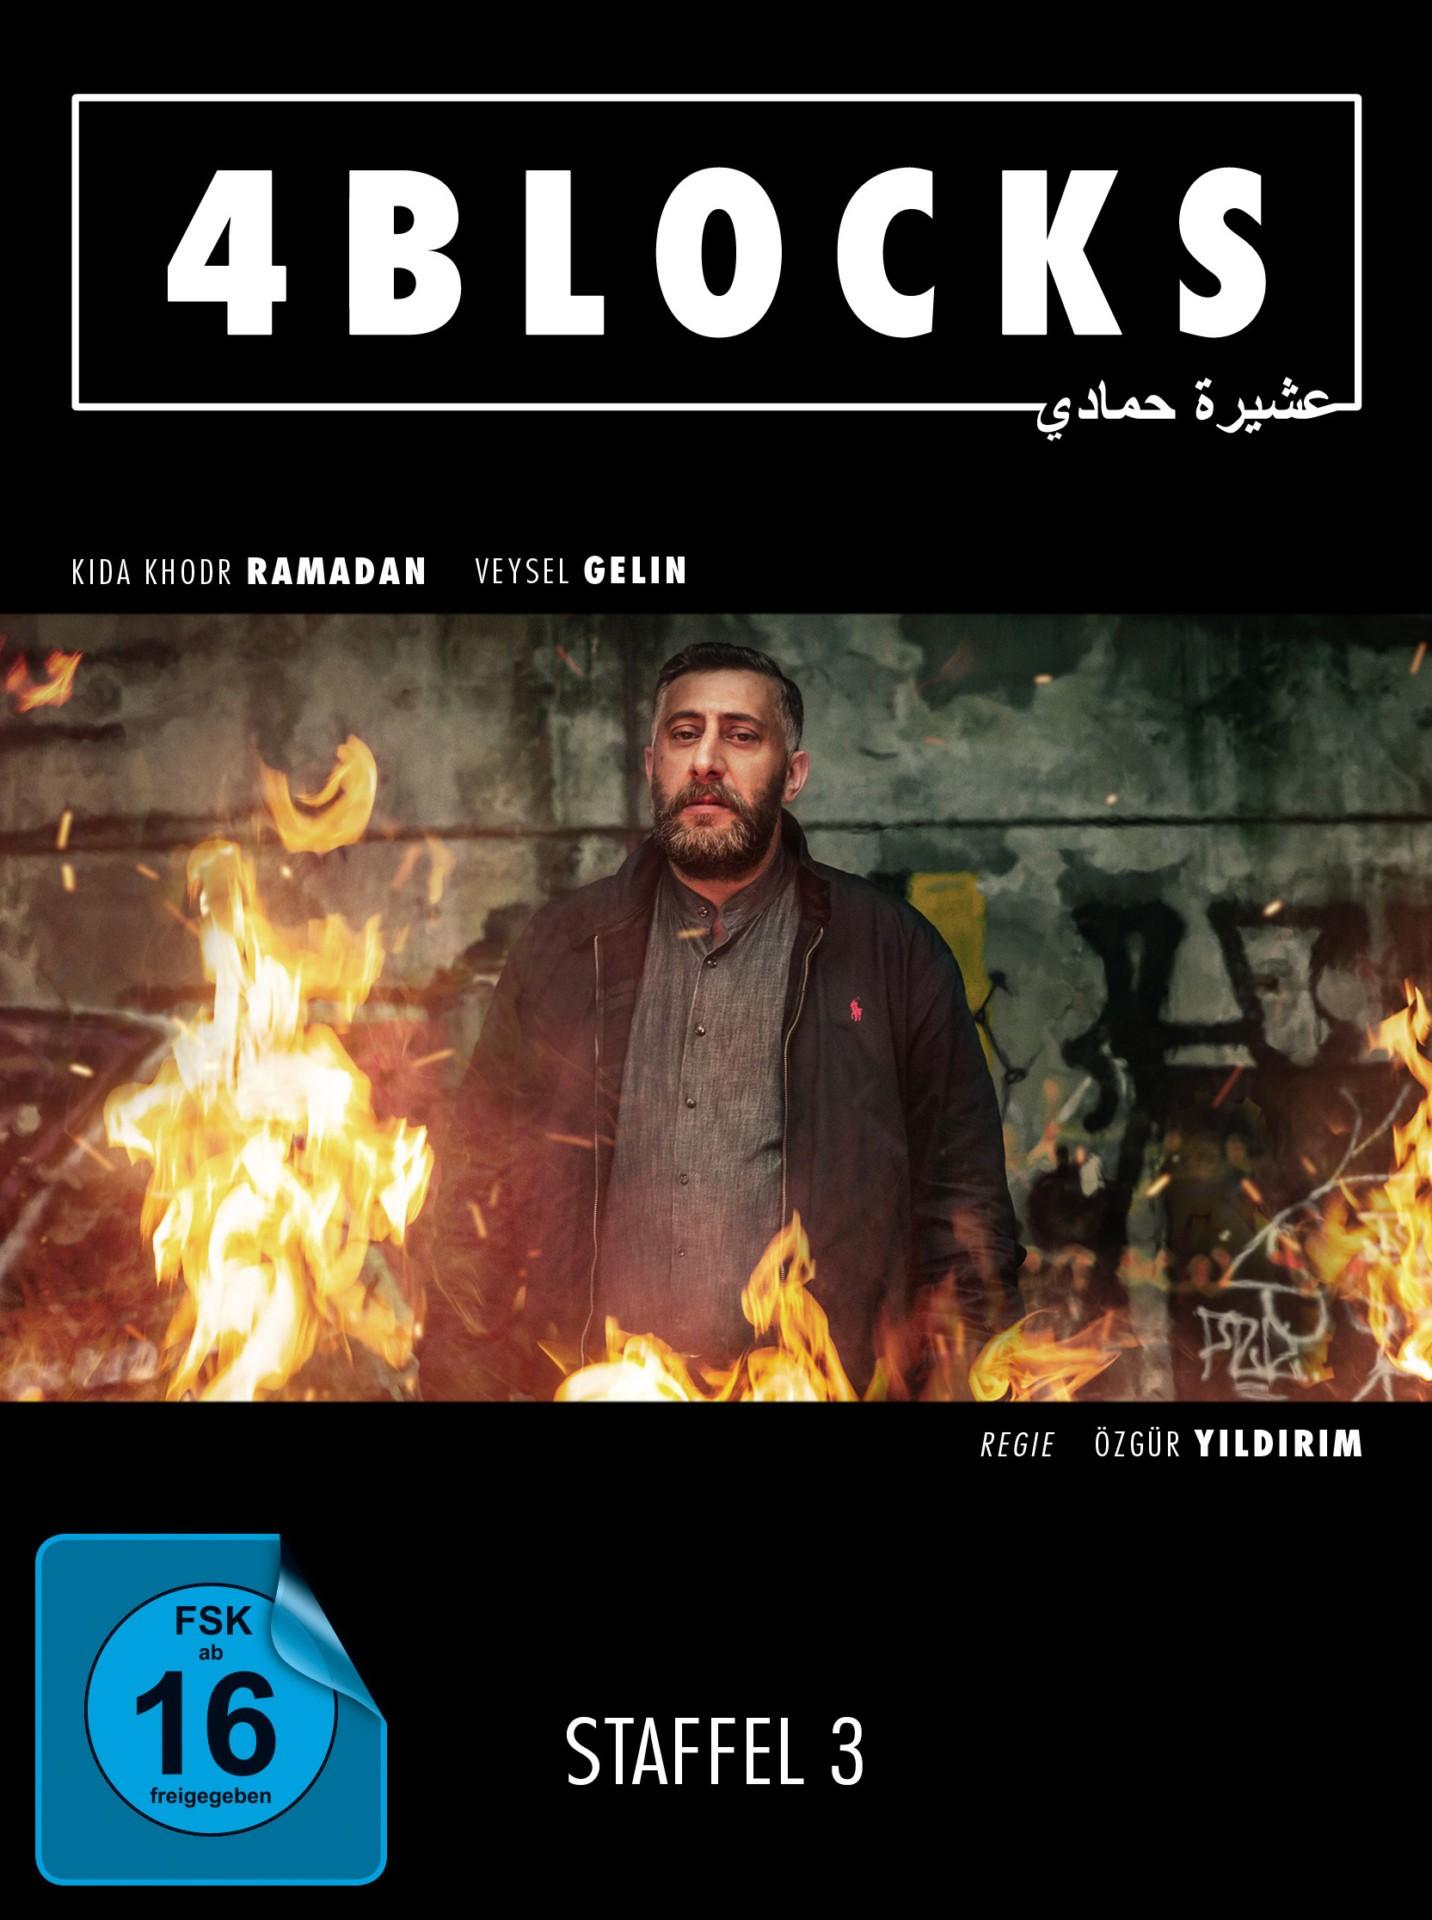 fileadmin  bilder 4 Blocks TV Serie dritte Staffel 4Blocks Cover neu 2 - OXMOX verlost Kinokarten und DVDs: